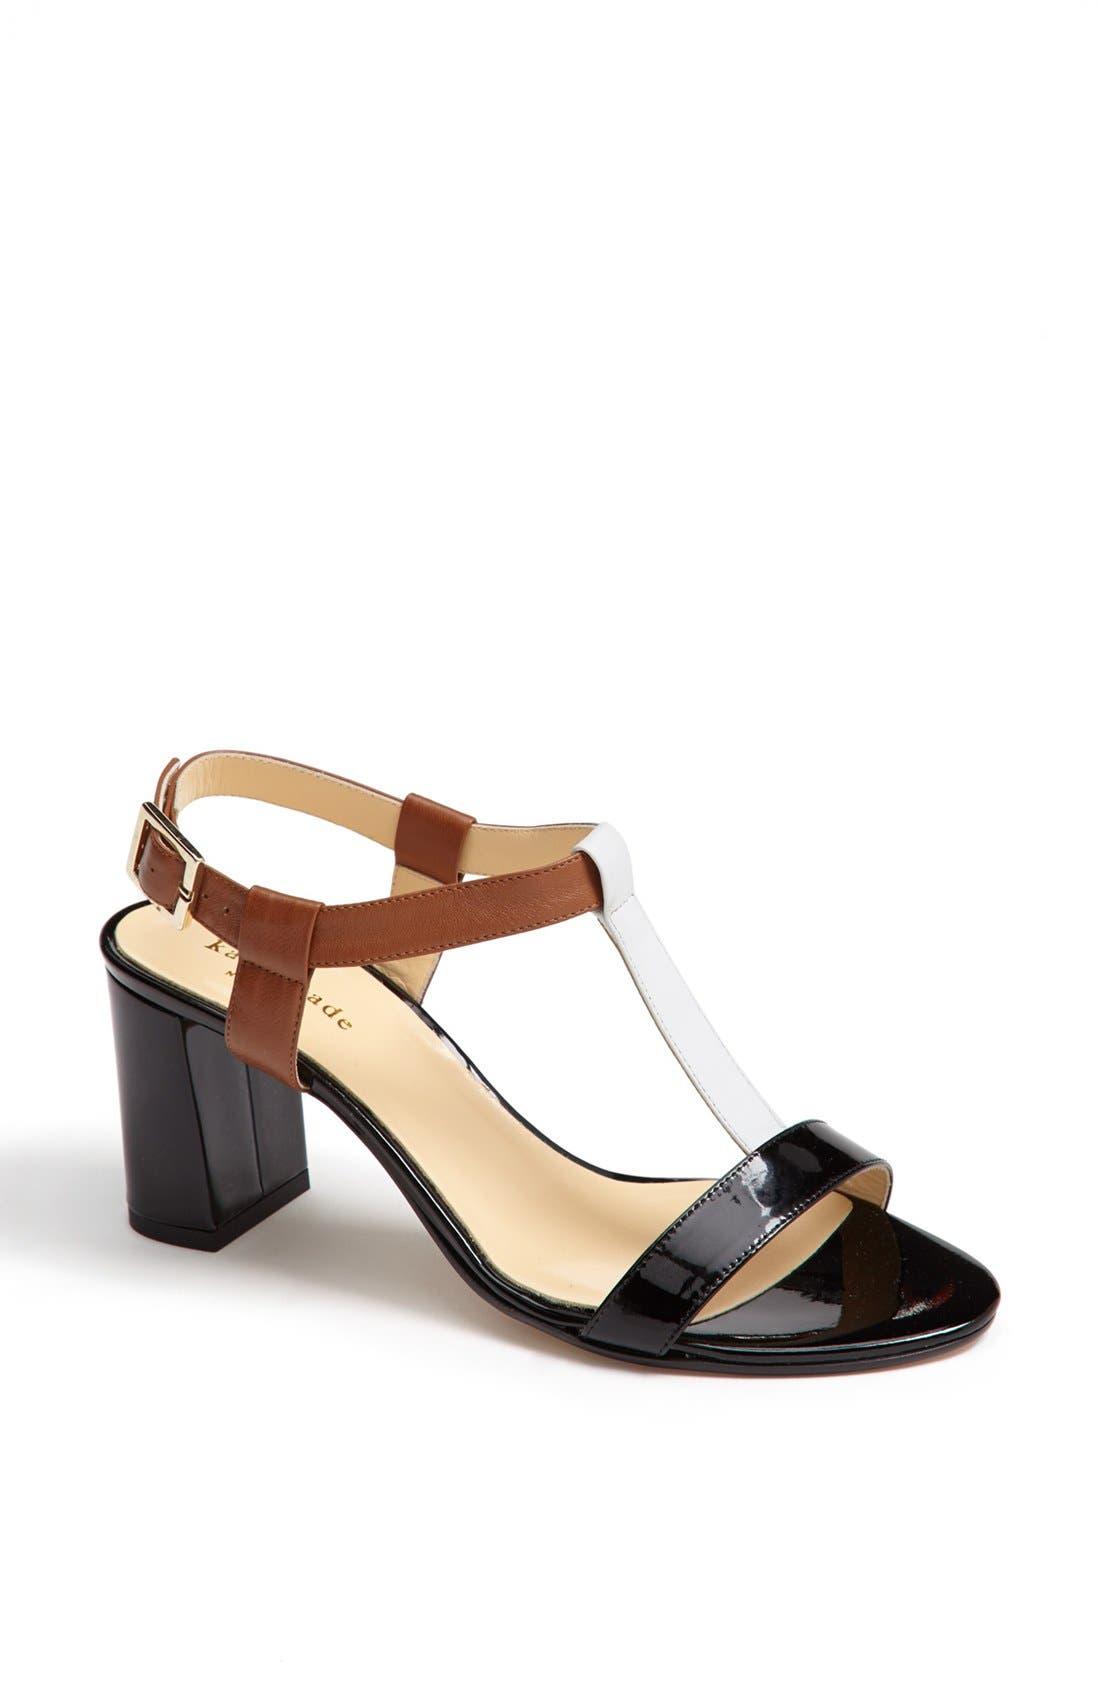 Alternate Image 1 Selected - kate spade new york 'aisha' sandal